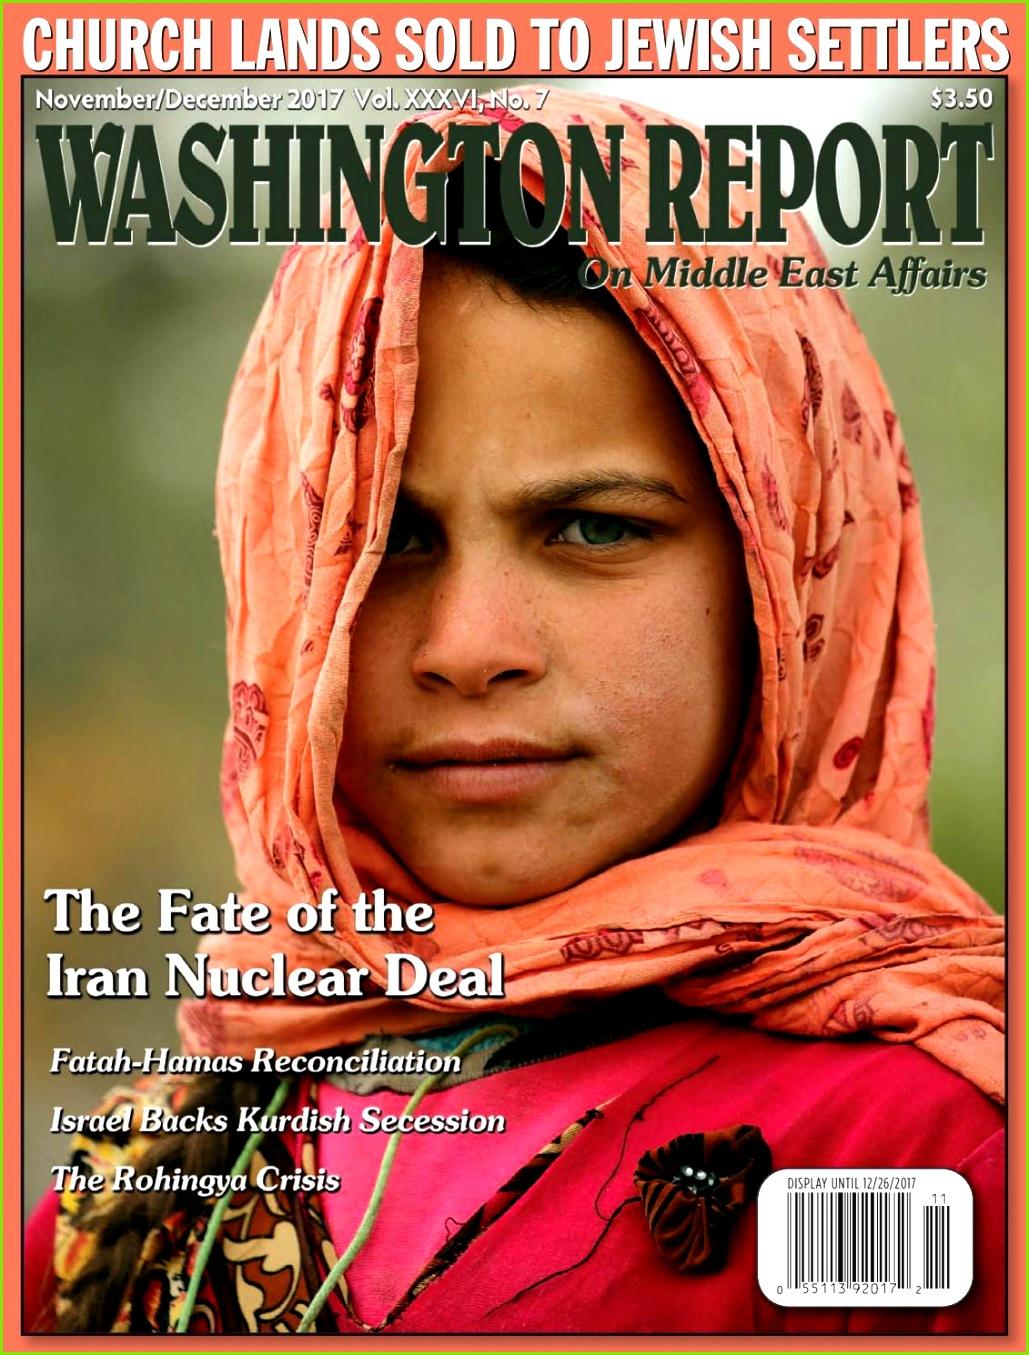 Washington Report November December 2017 Vol XXXVI No 7 by American Educational Trust issuu